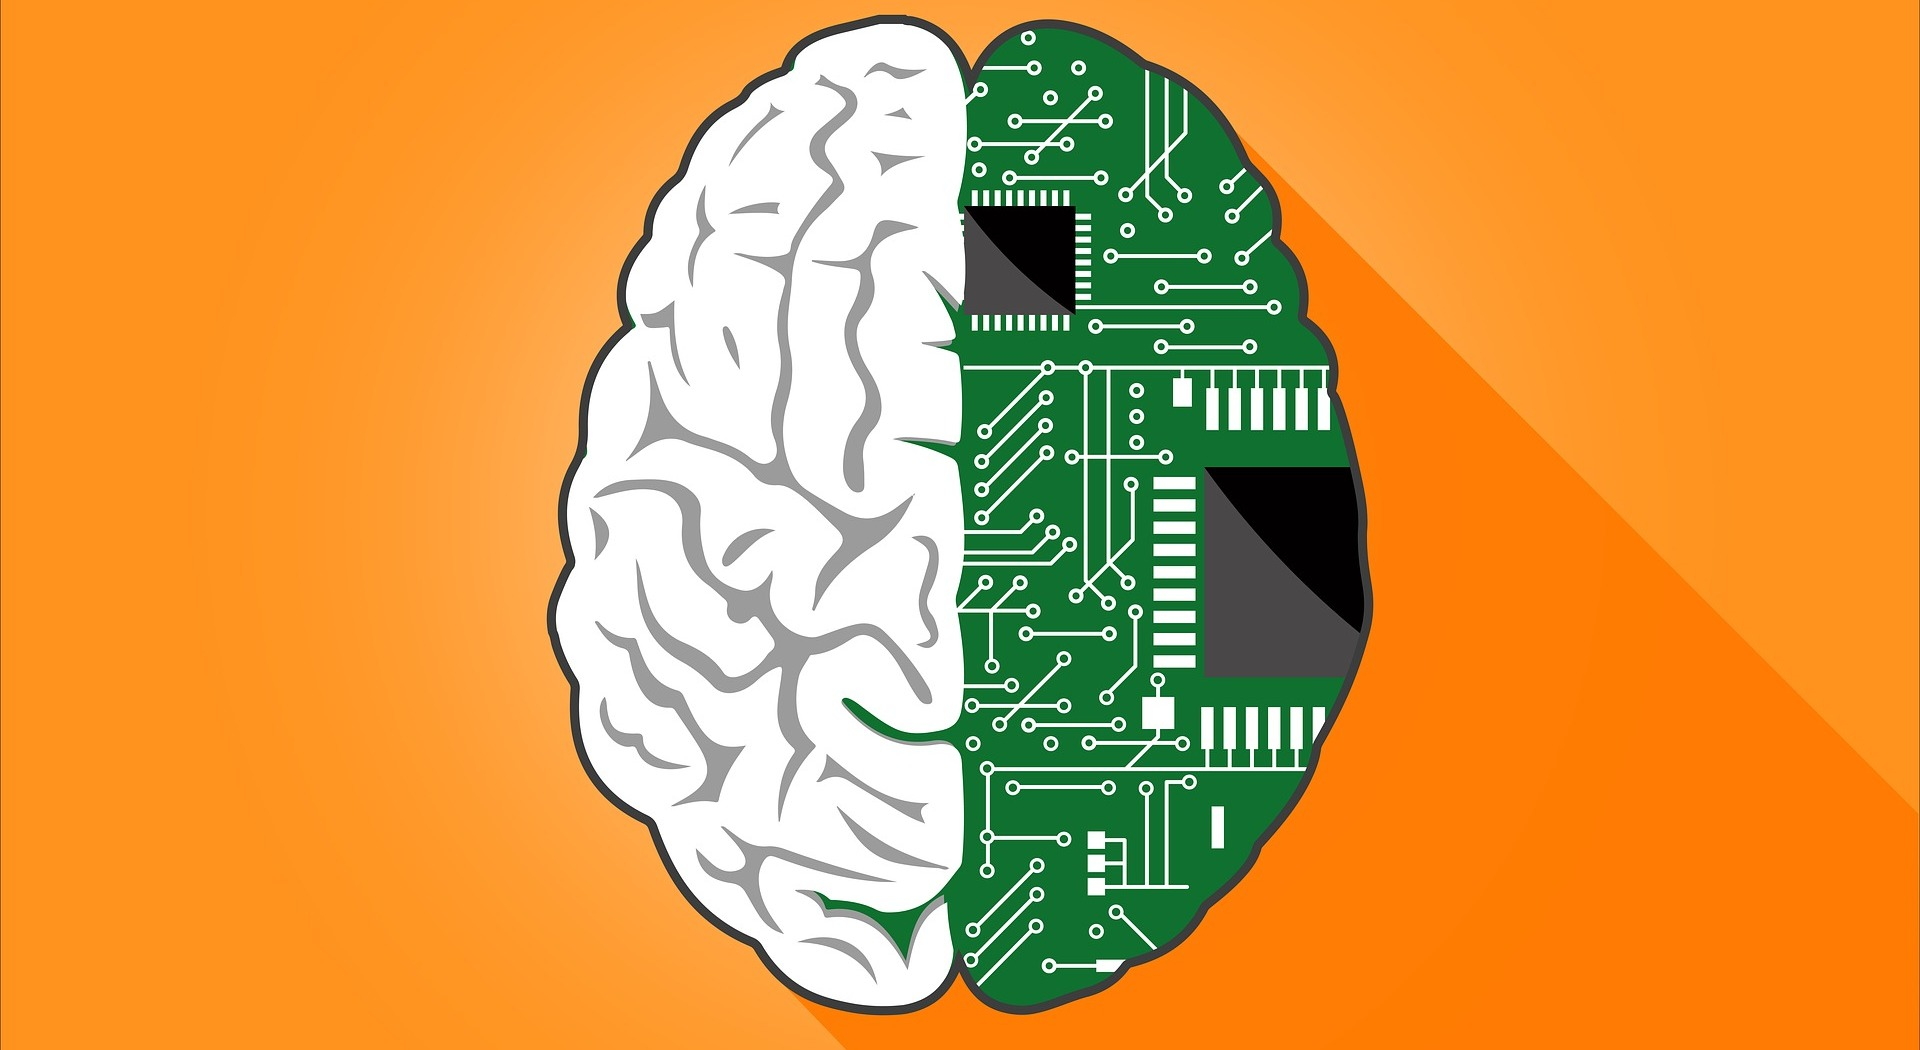 brain-technology.jpg